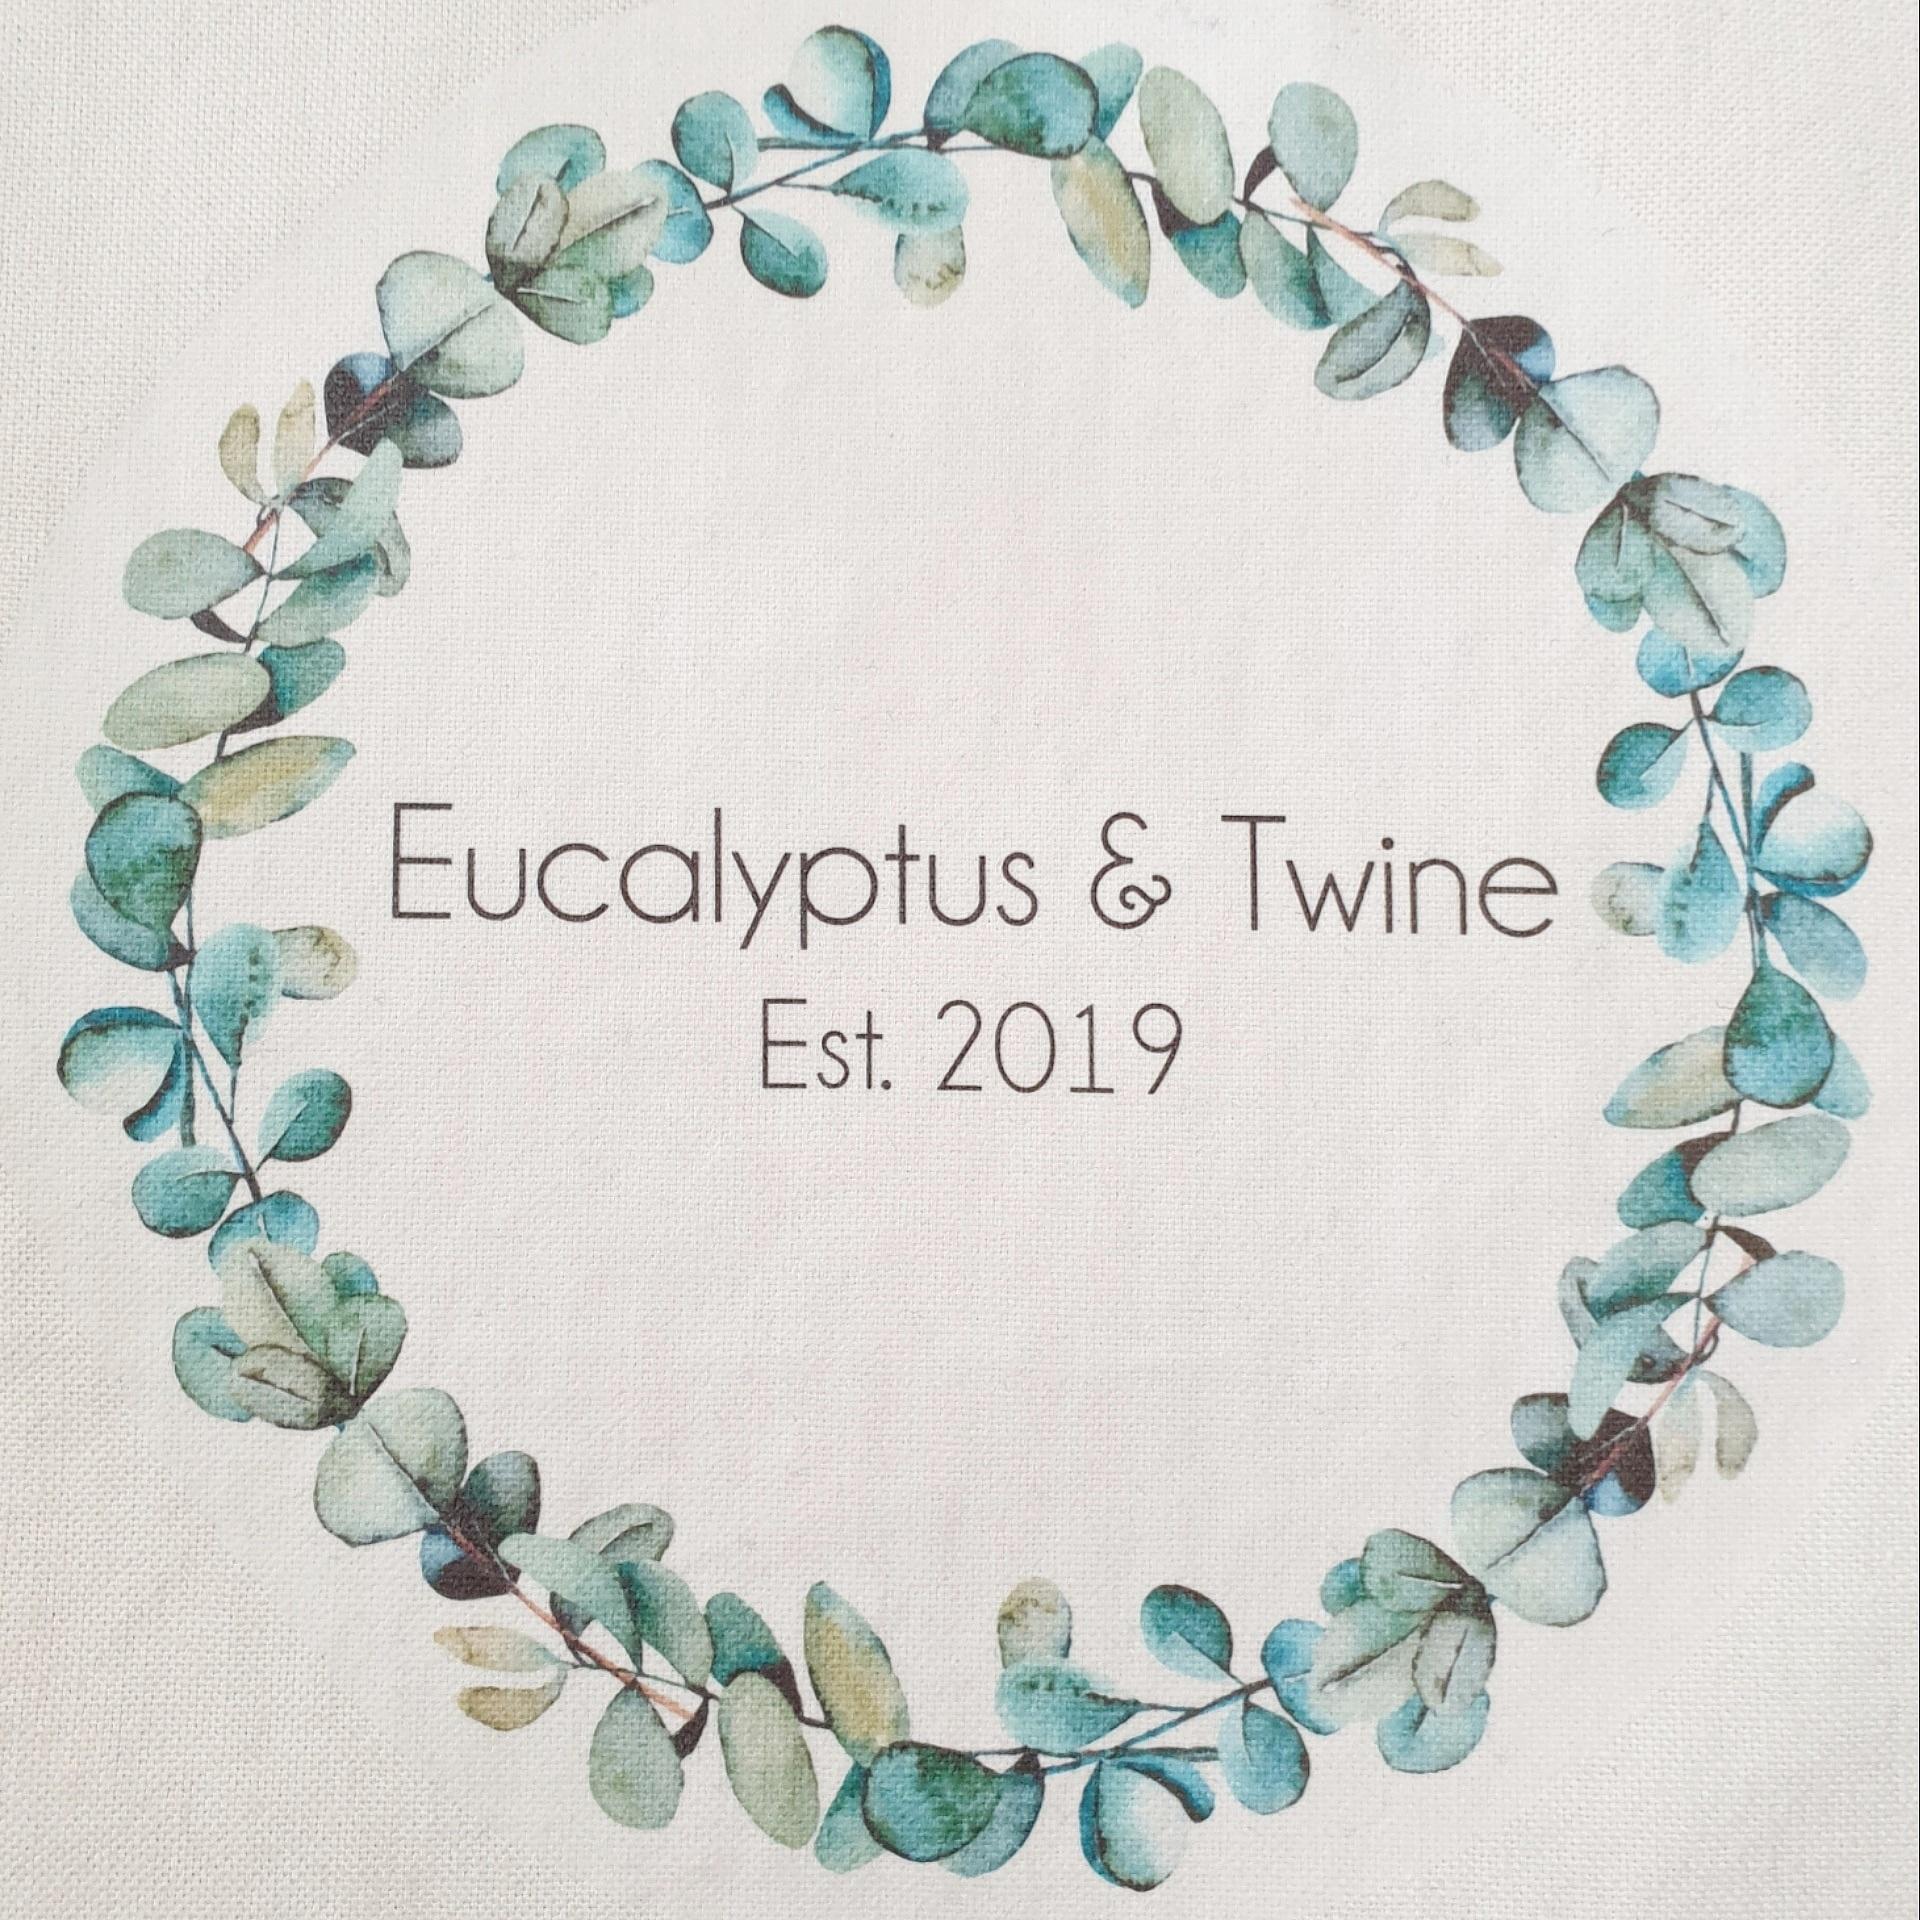 Eucalyptus & Twine